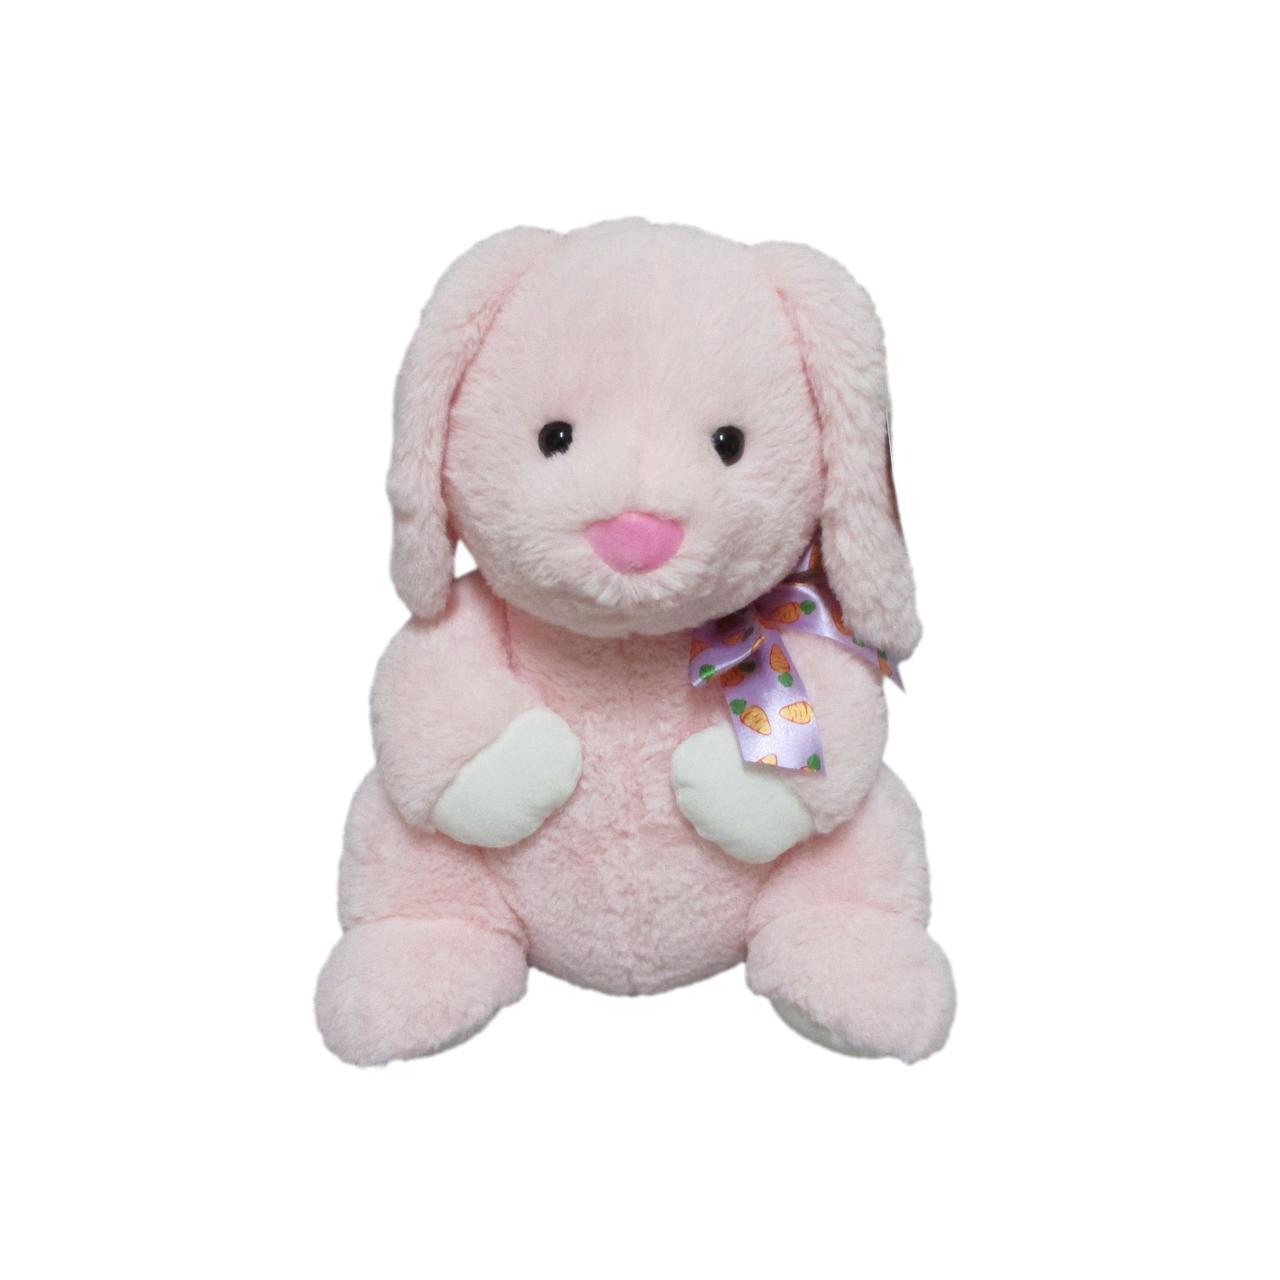 Way To Celebrate Мягкая игрушка пасхальный зайчик розовый Easter Standing Pink Bunny